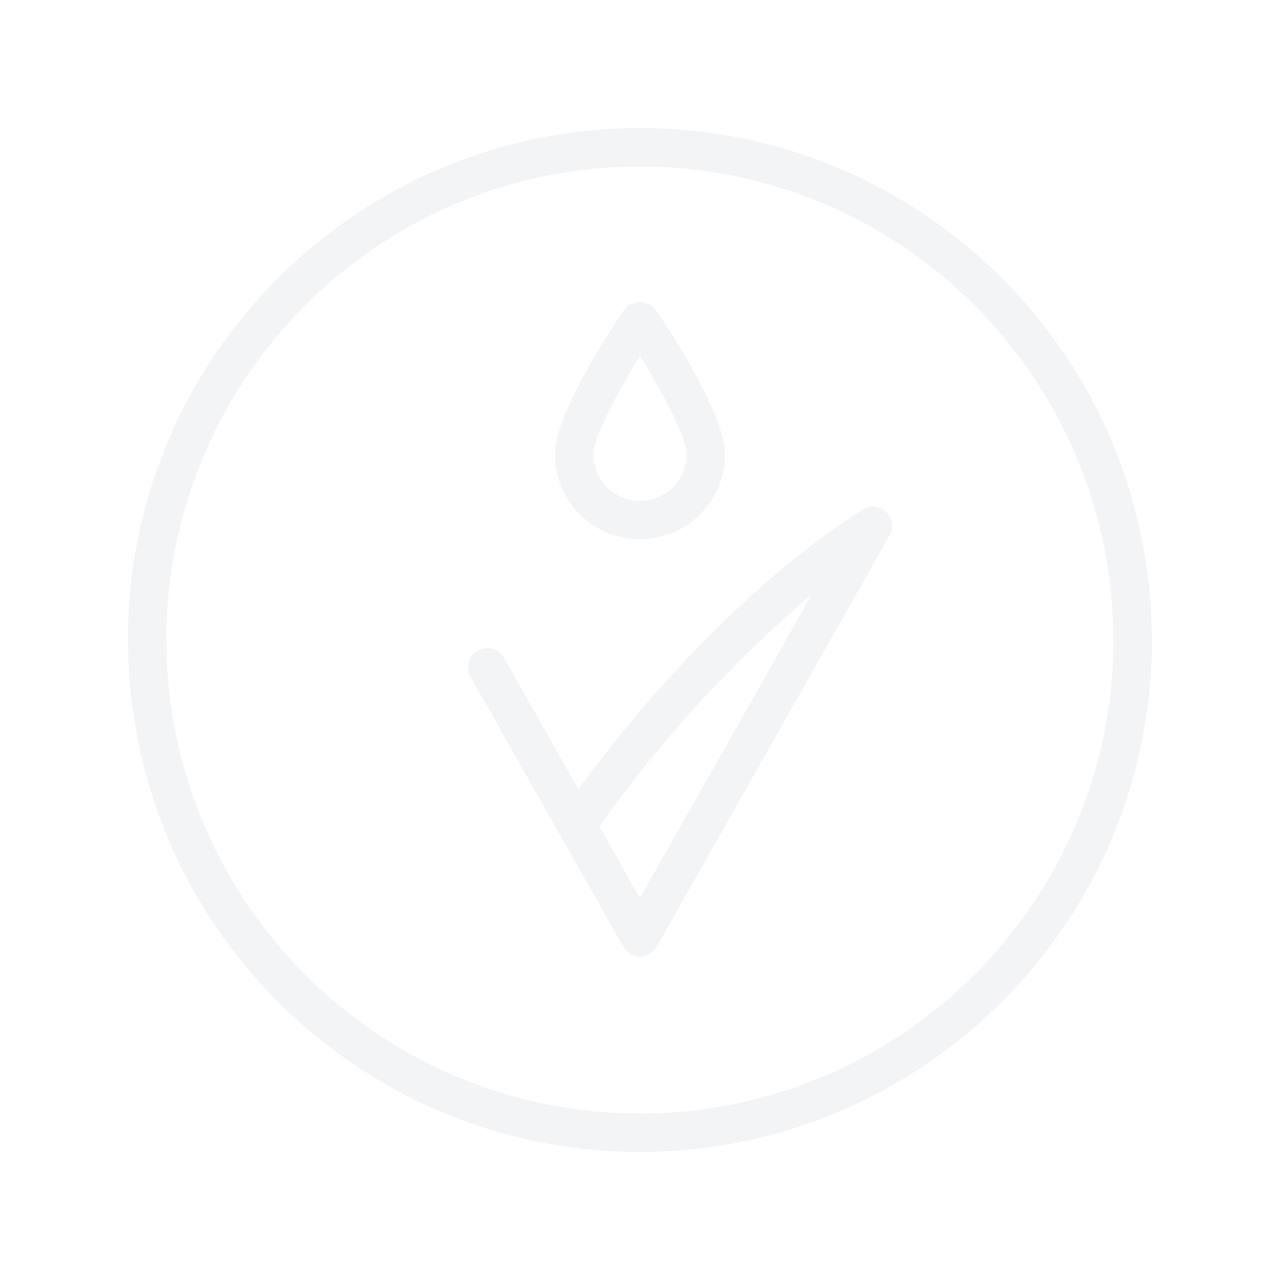 SAMPURE MINERALS Brow Pencil Brown карандаш для бровей